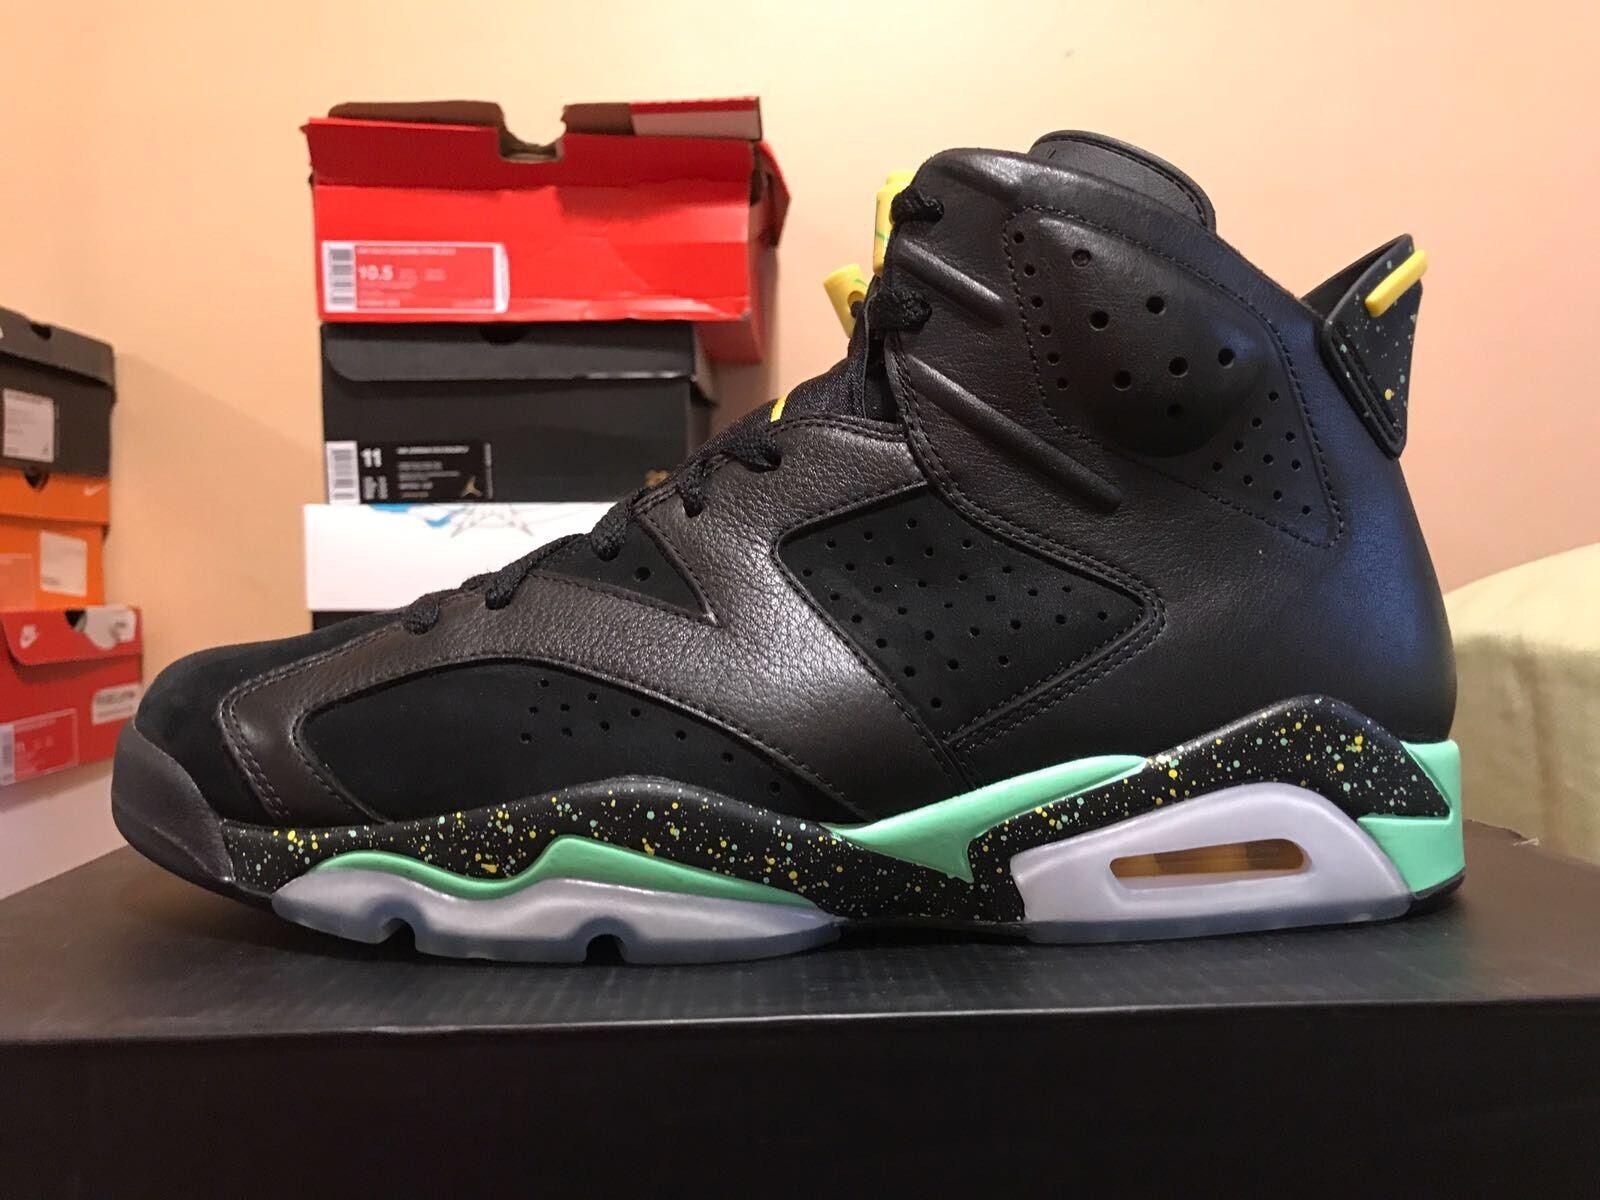 Nike Air Jordan VI 6 Brazil Pack QS Infrared Premium 688446 020 World Cup